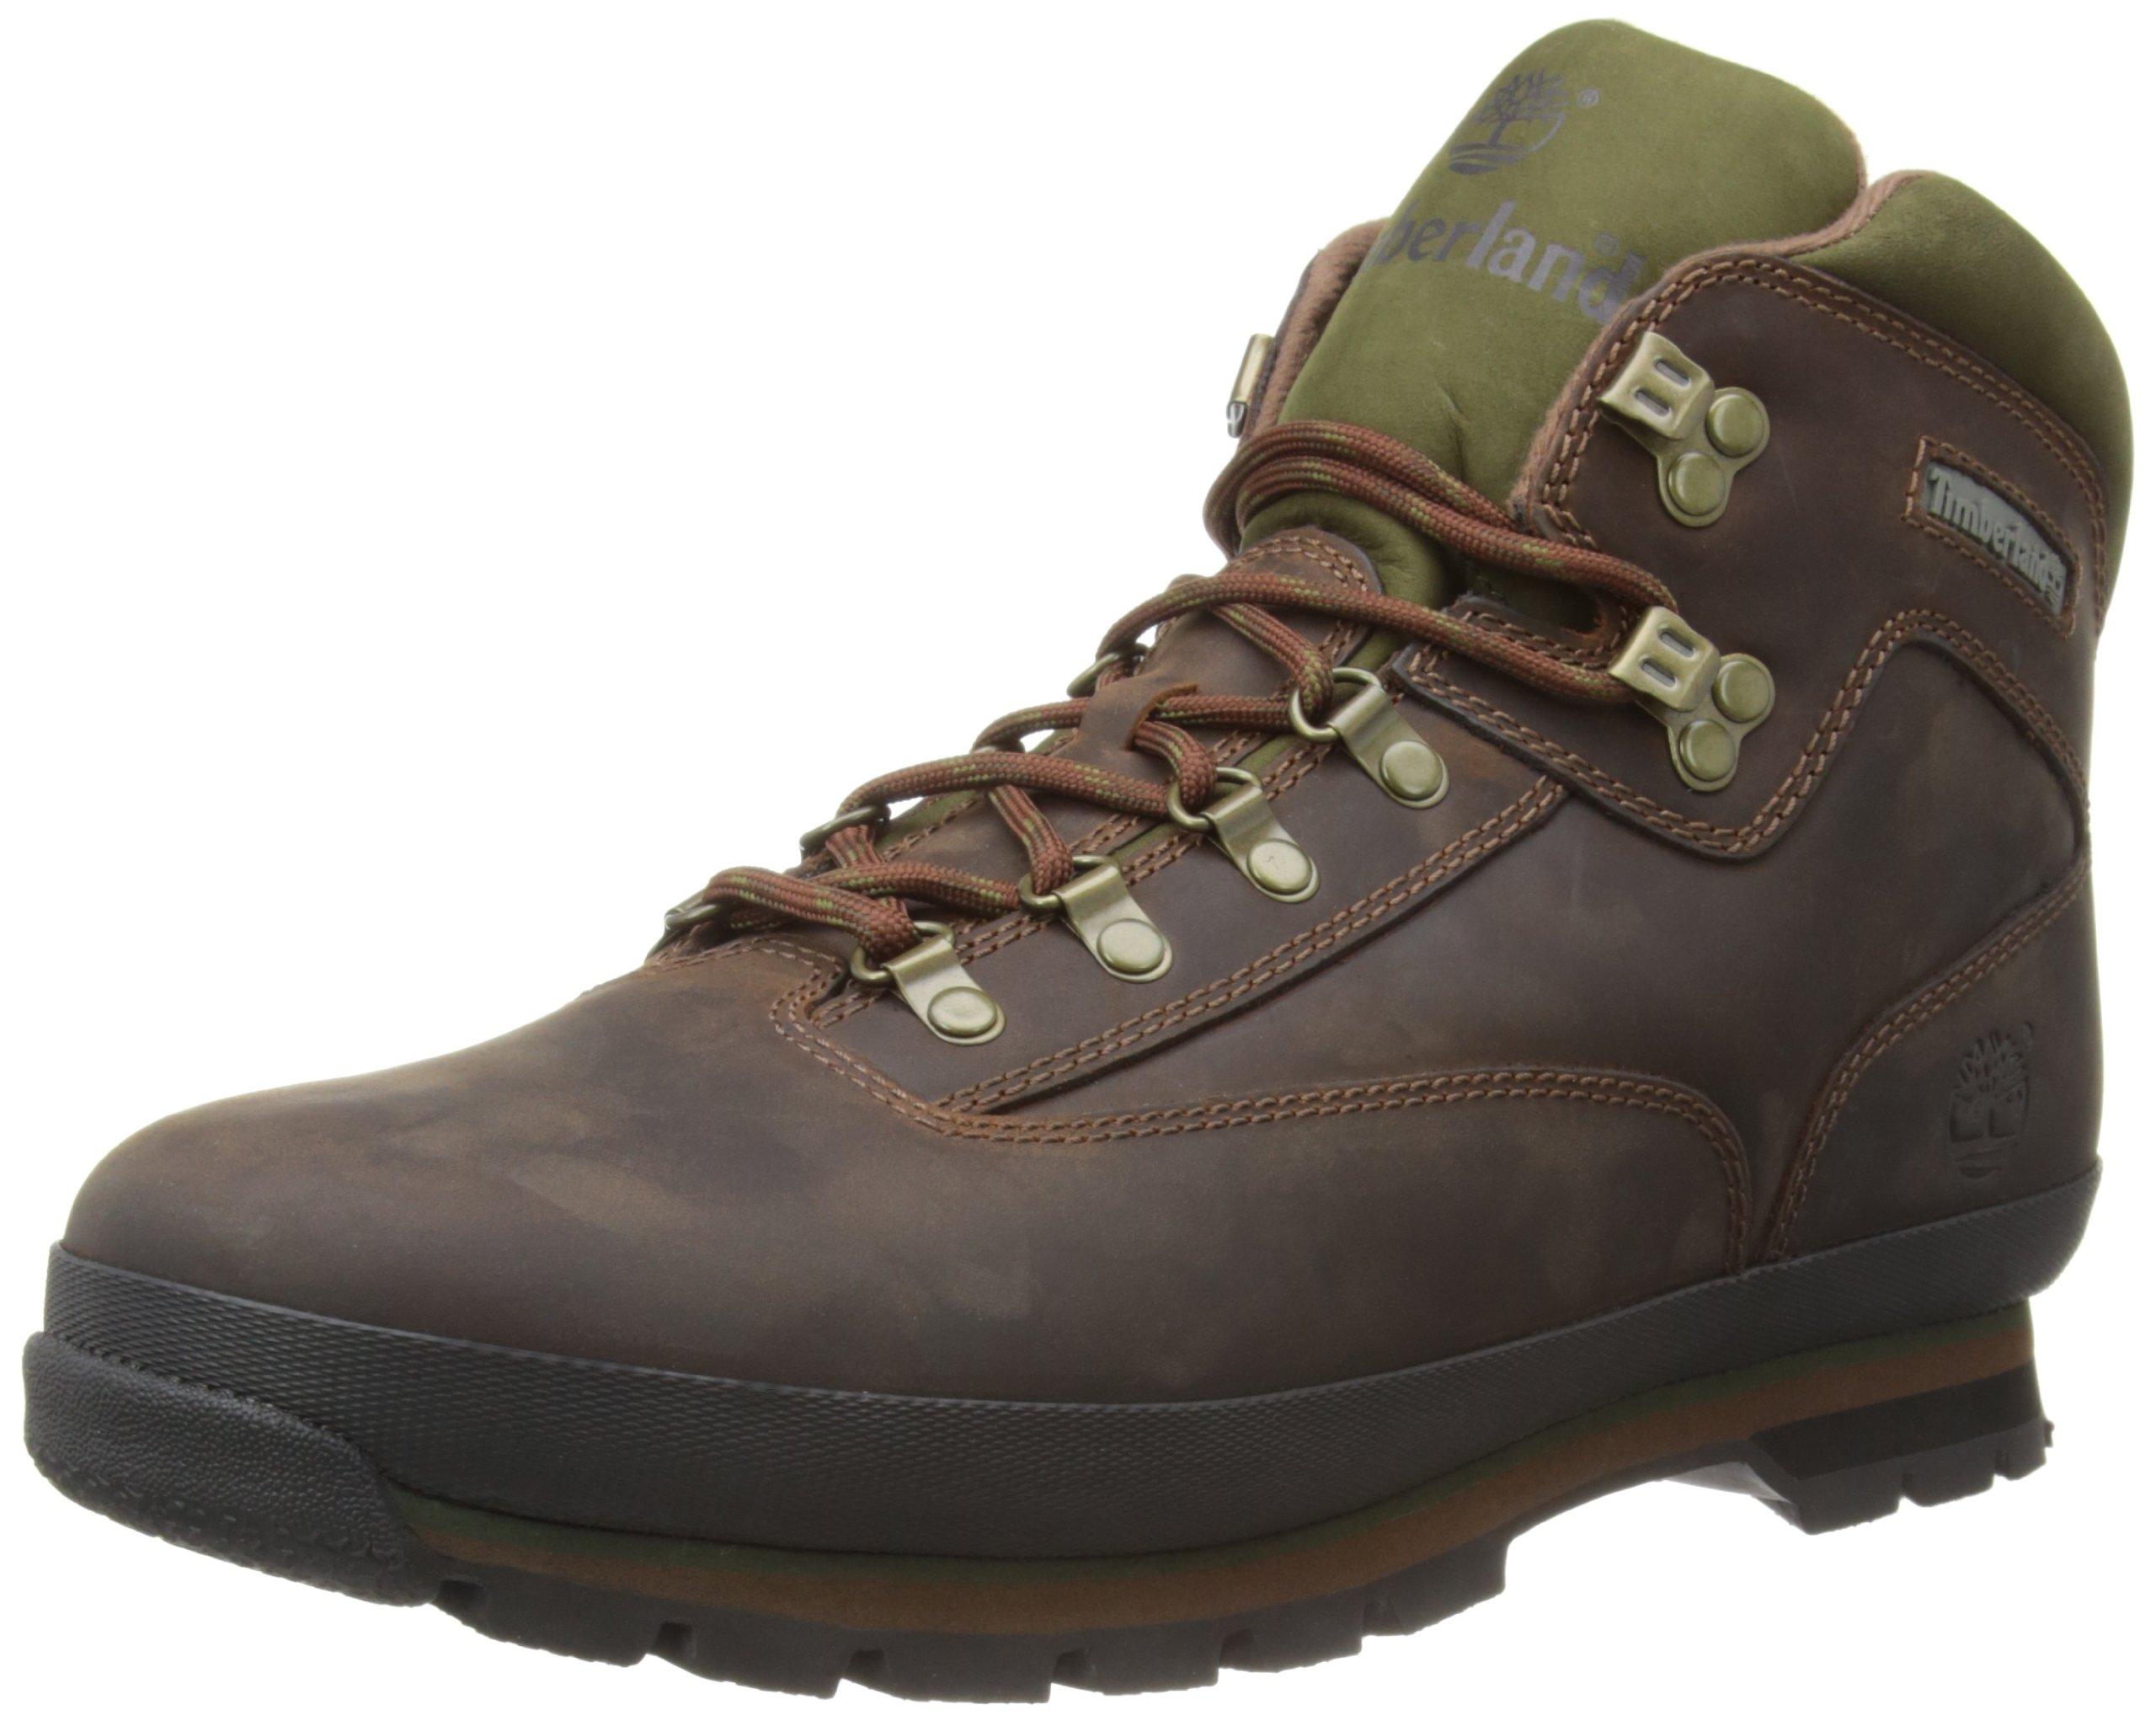 Timberland Men's Euro Hiker Boot,Brown,10 M